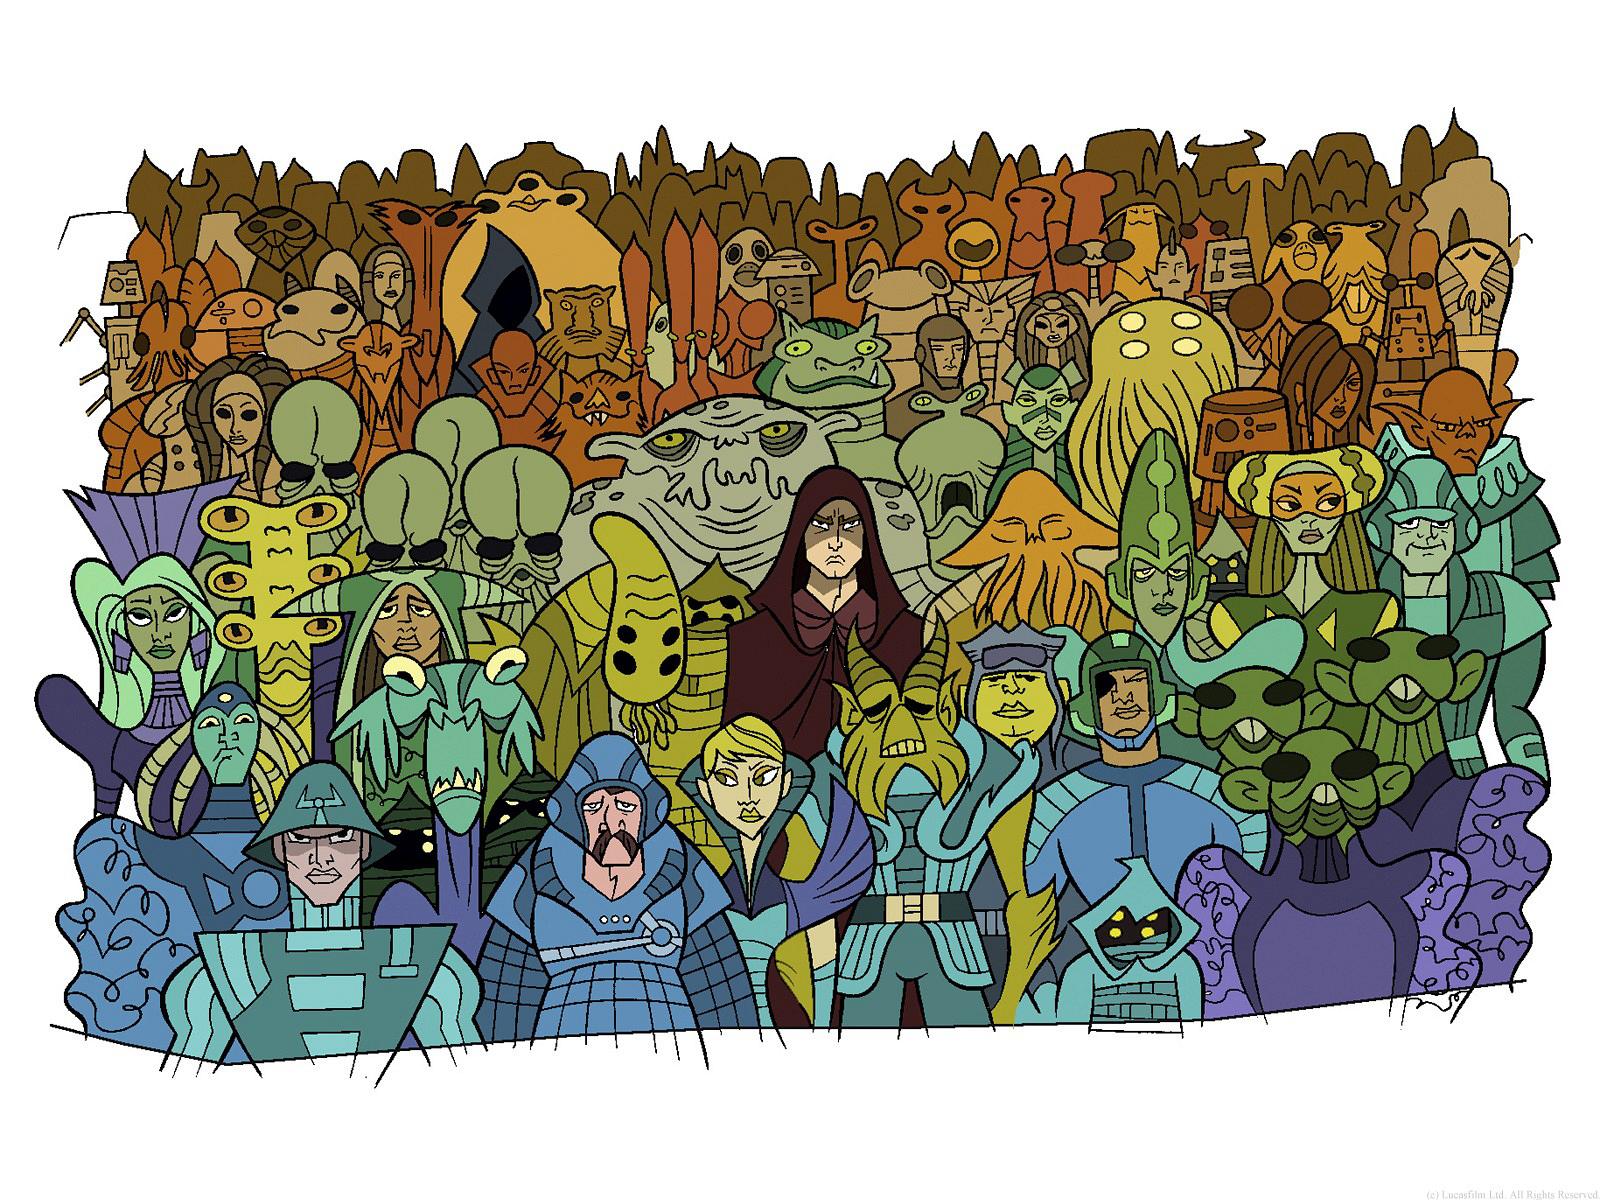 Free Download The Star Wars Trilogy Star Wars Clone Wars Wallpaper